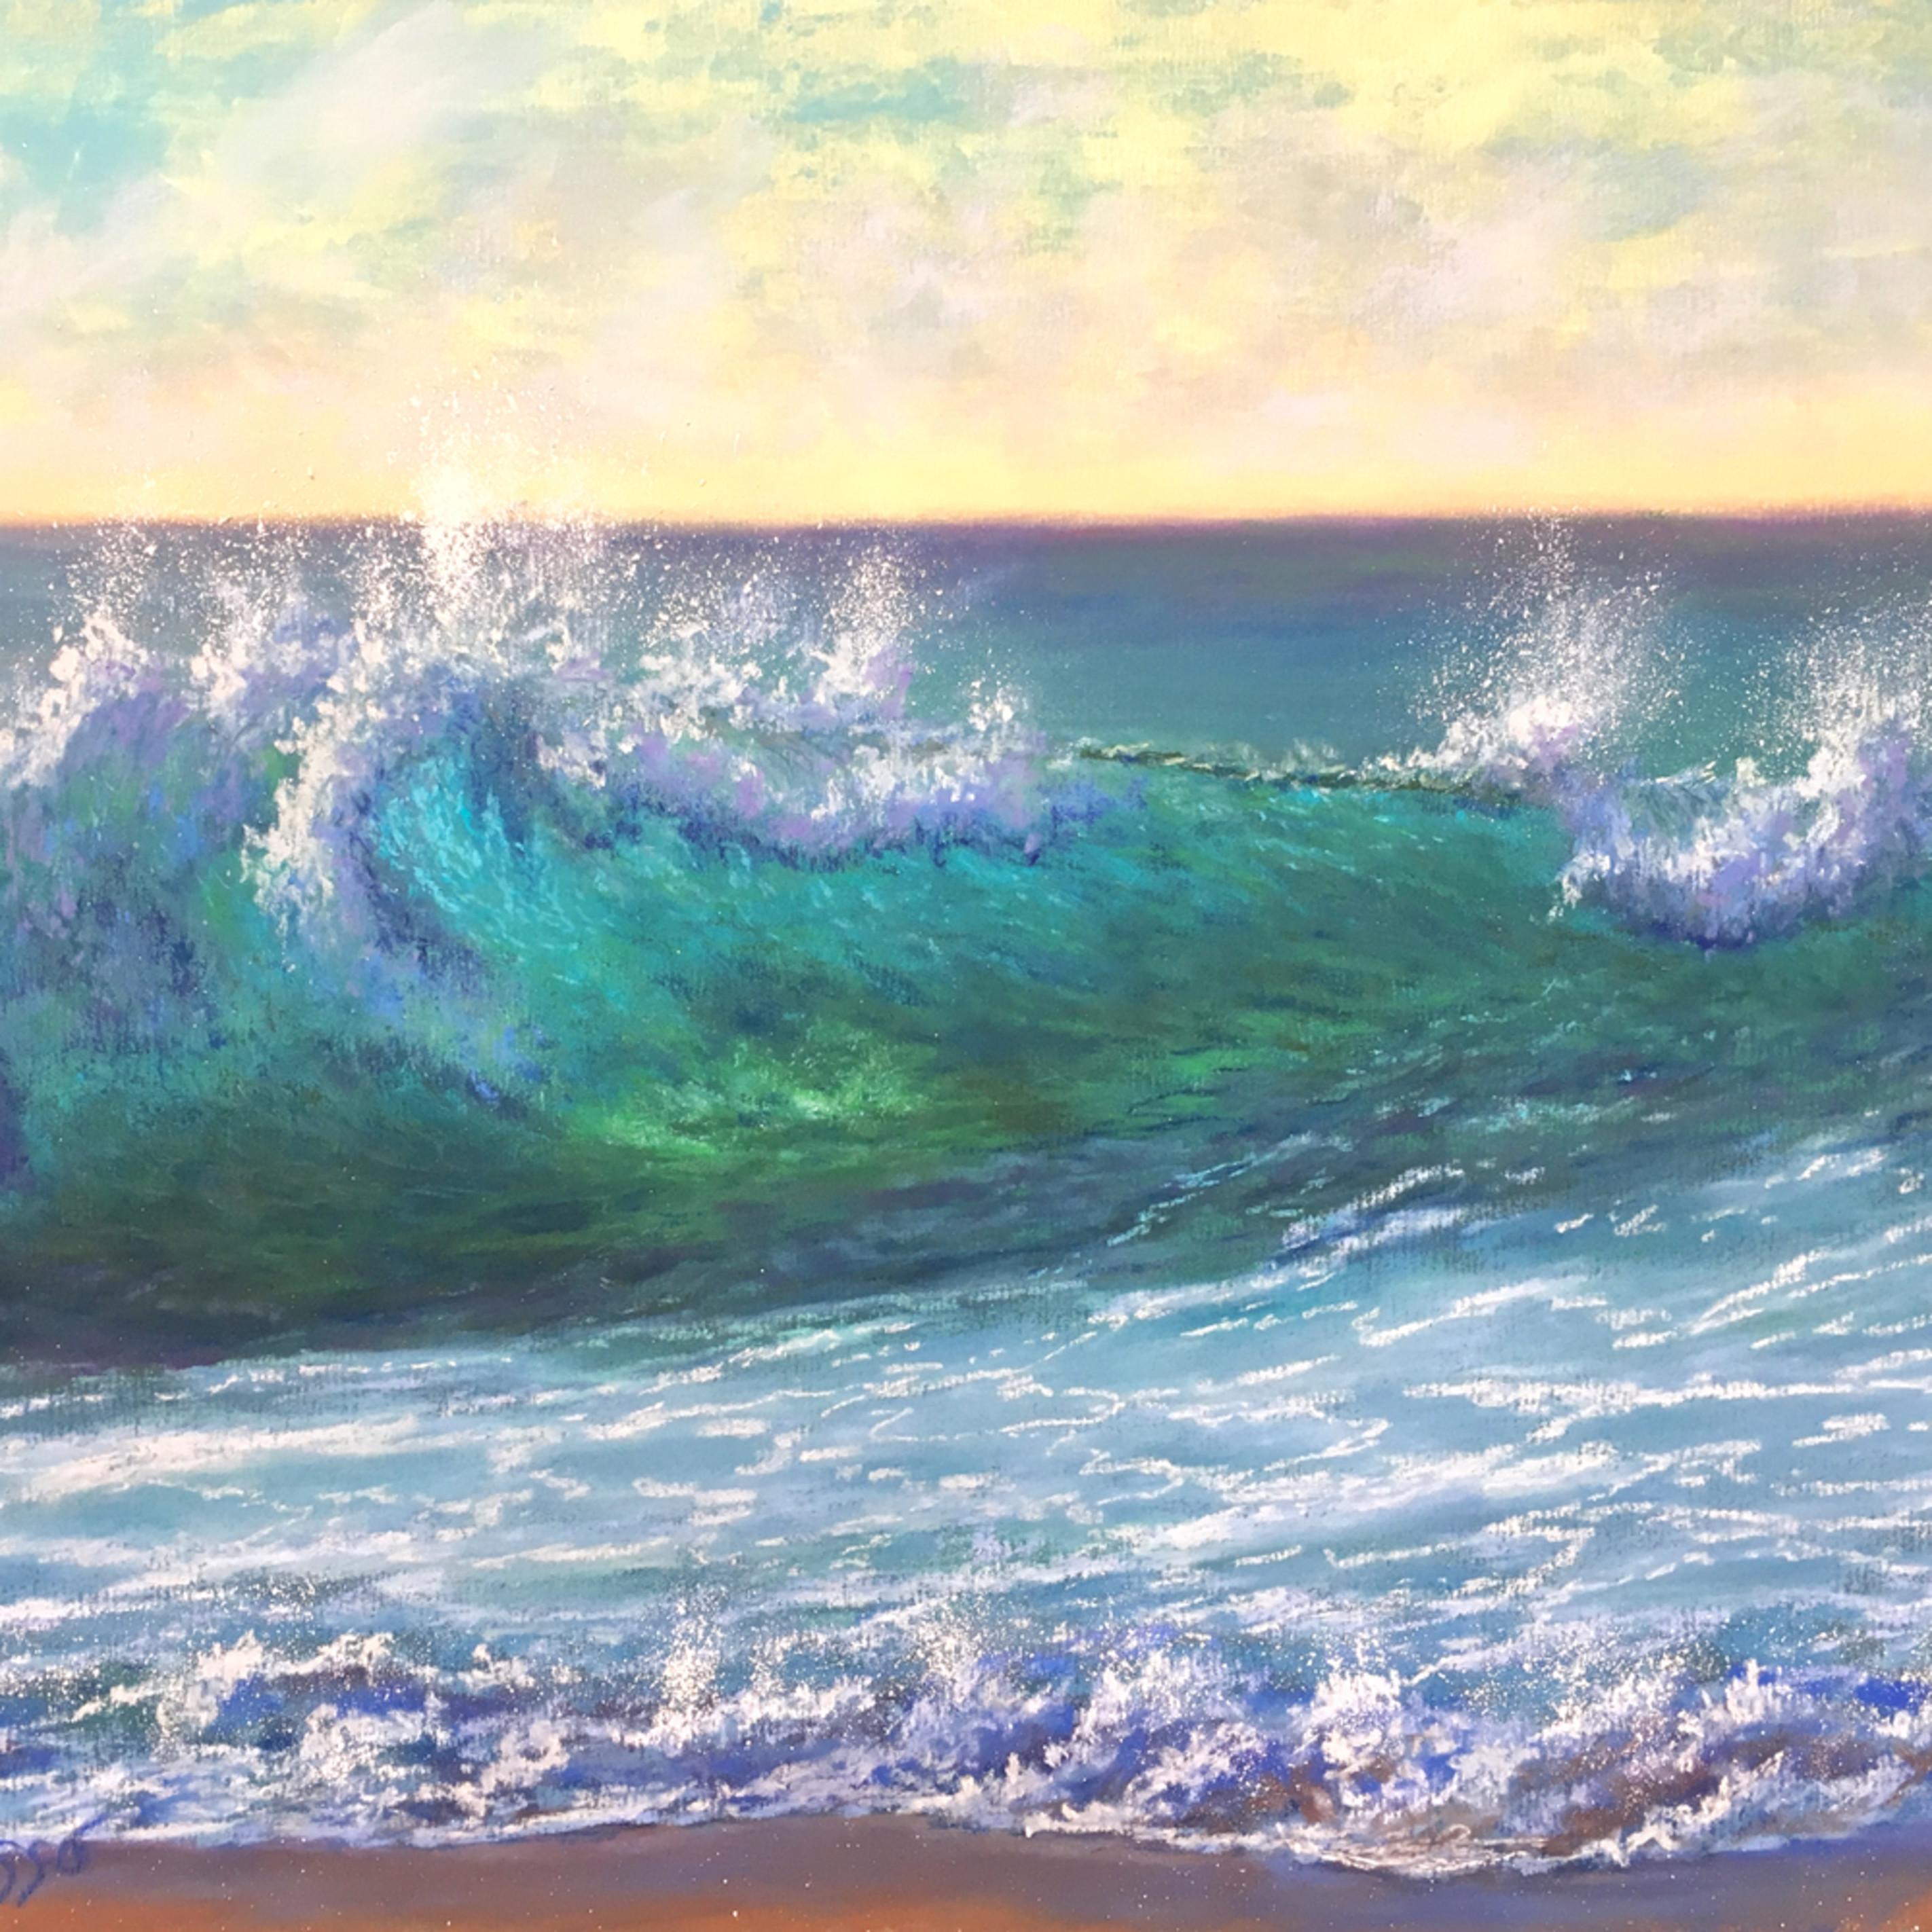 Turquoise morning surf czpkkx